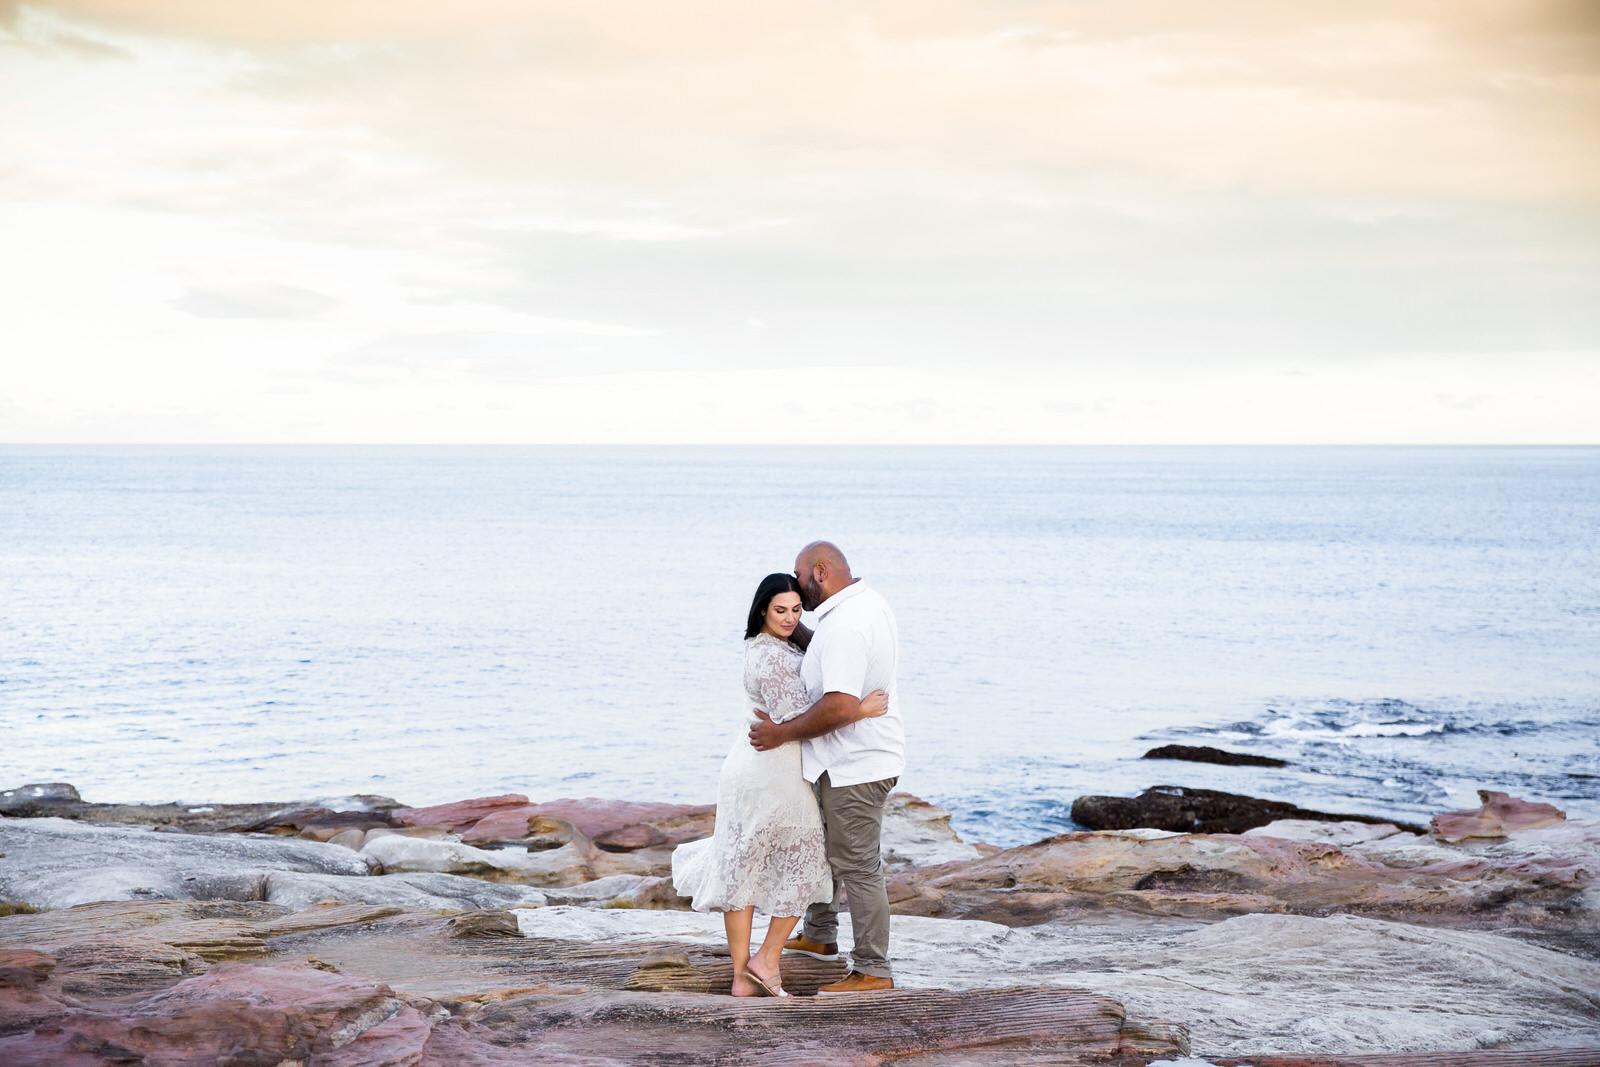 Sydney Wedding Photographer - Maroubra Beach - Jennifer Lam Photography (22).jpg